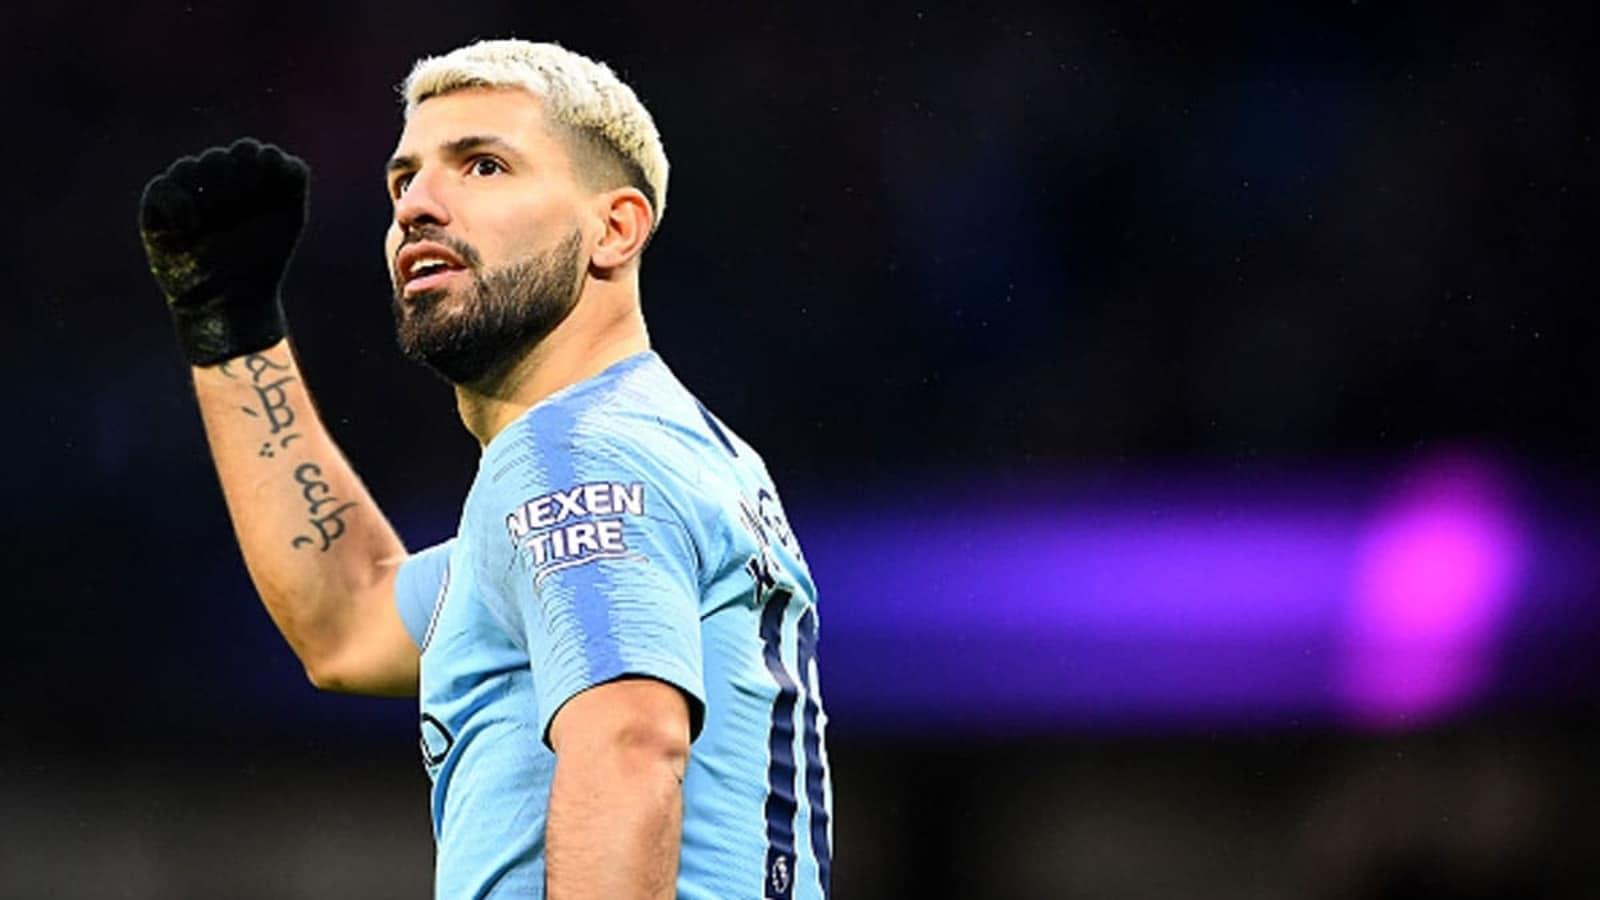 Premier League Champions Manchester City Pay Tribute To Sergio Aguero Through Their New Home Kit For 2021 22 Season Football News Hindustan Times